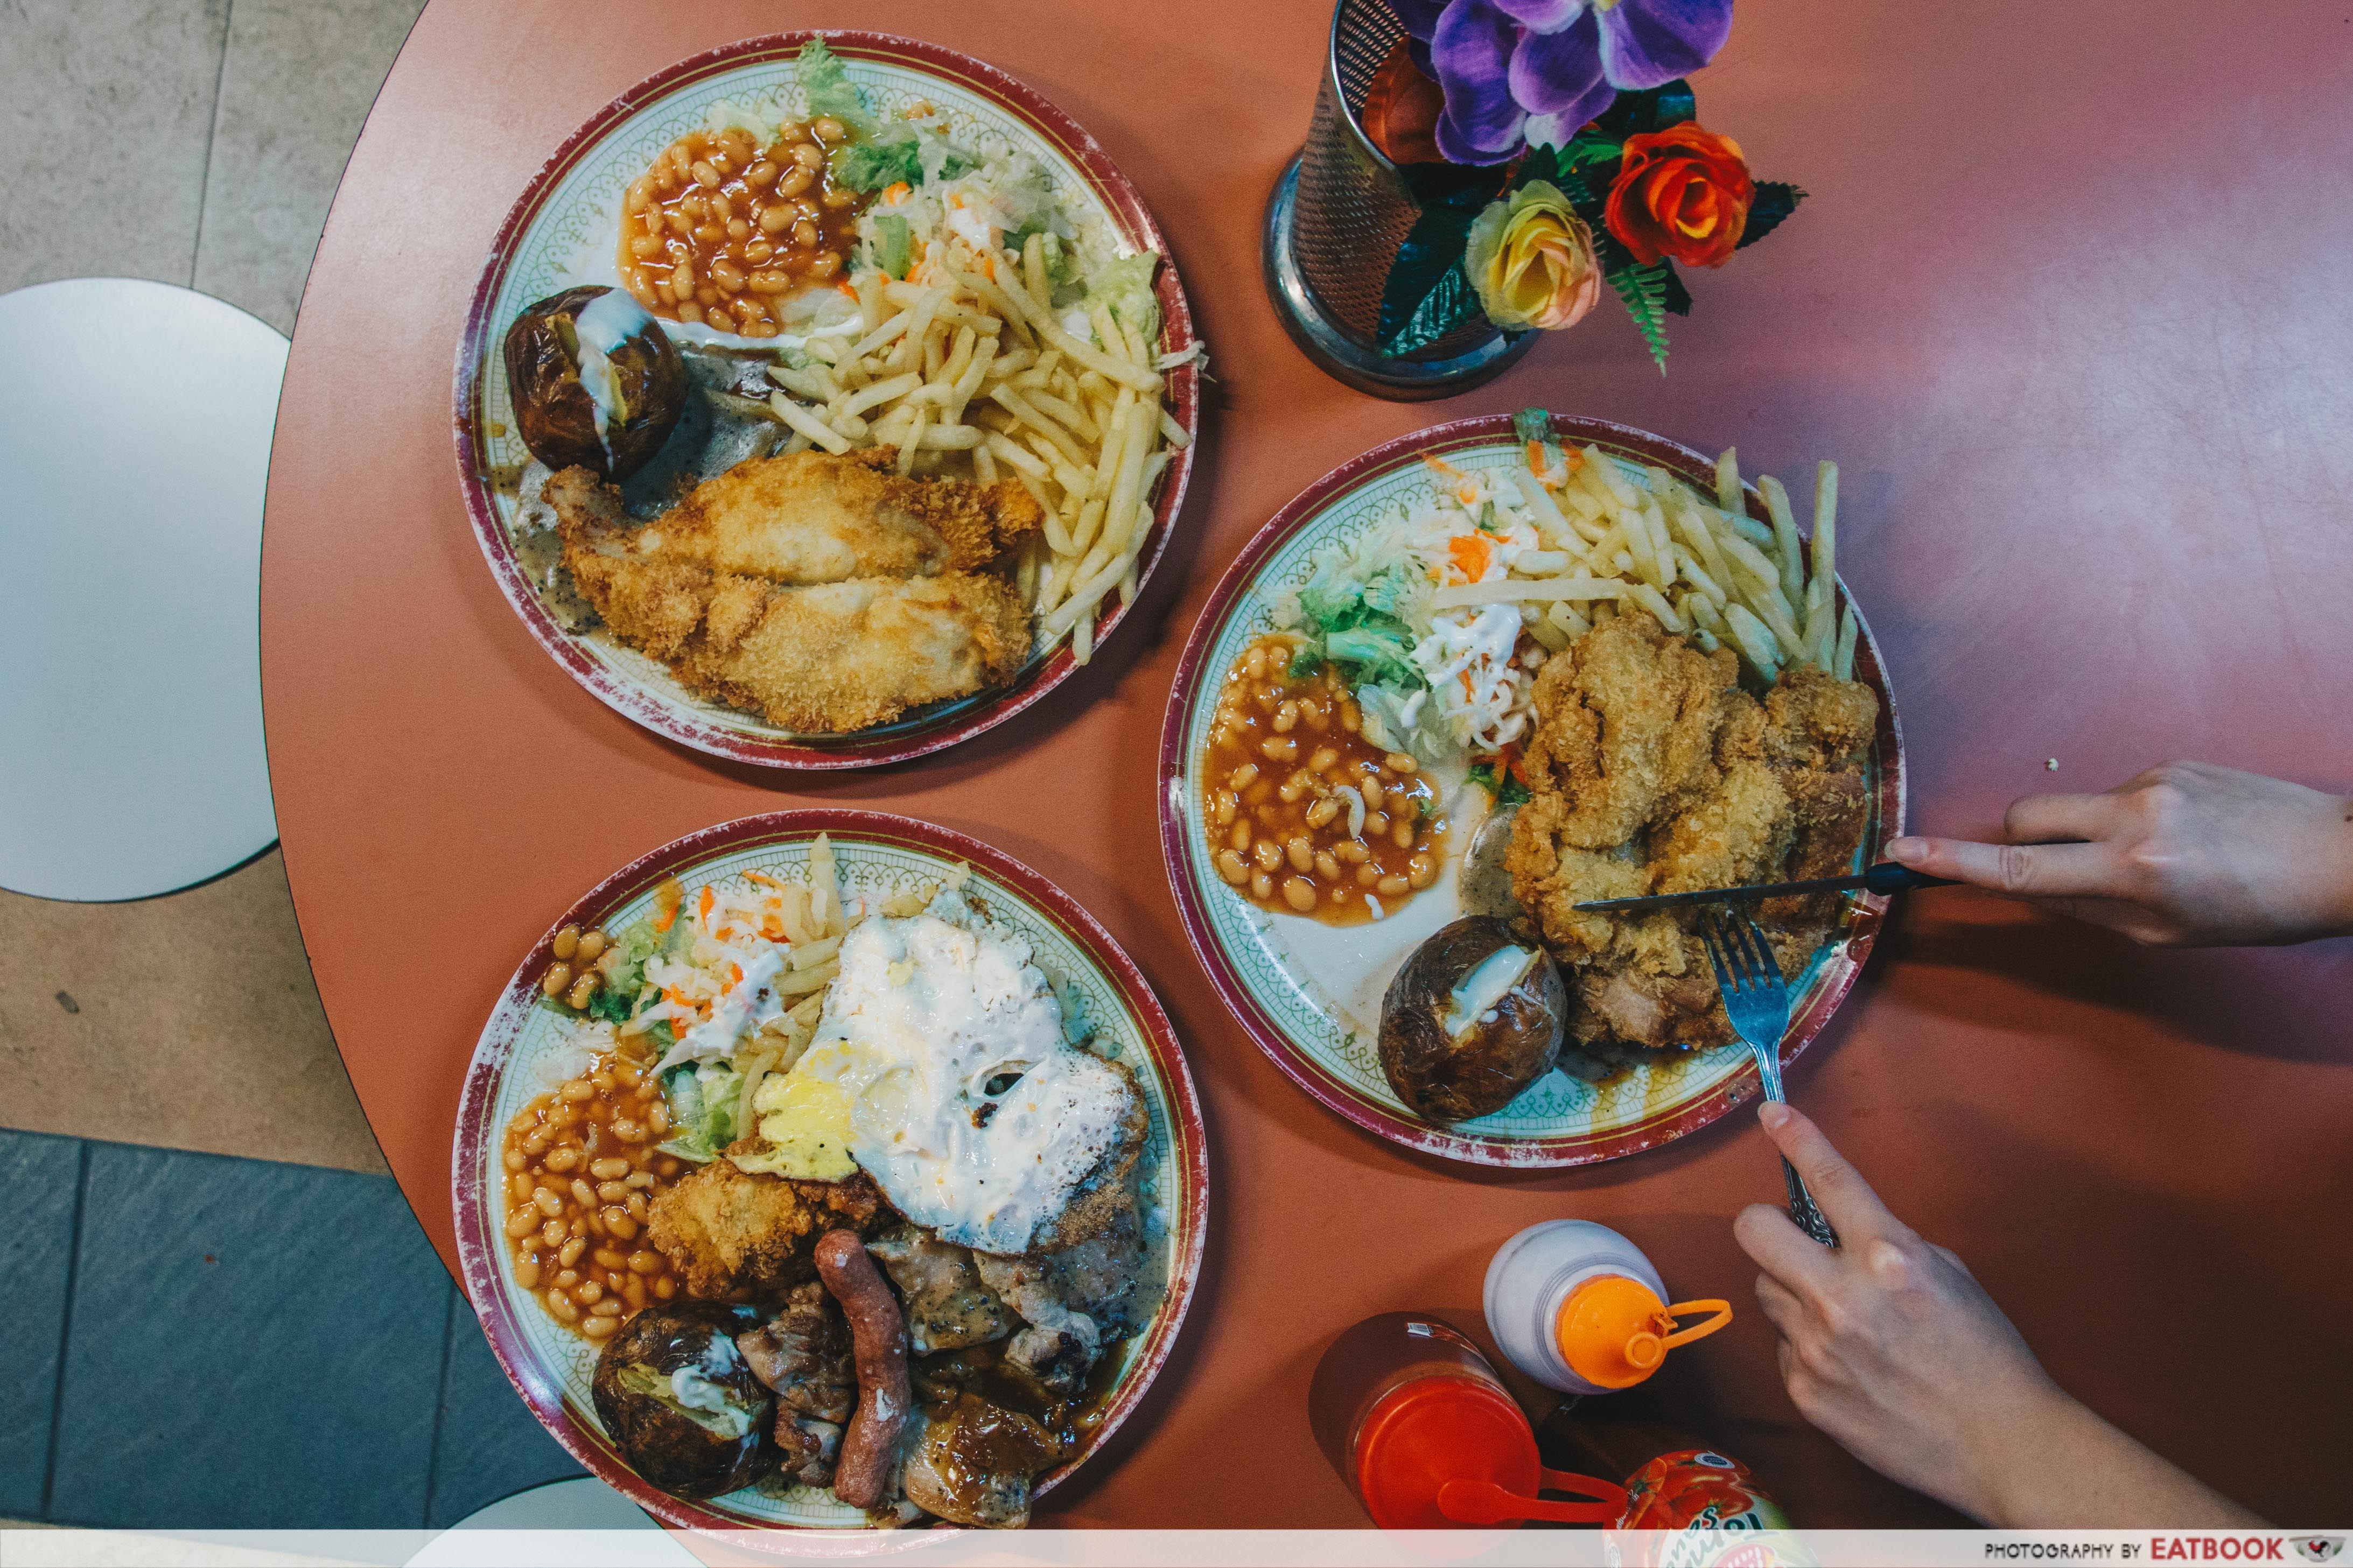 Chef Hainanese Western Food-flatlay